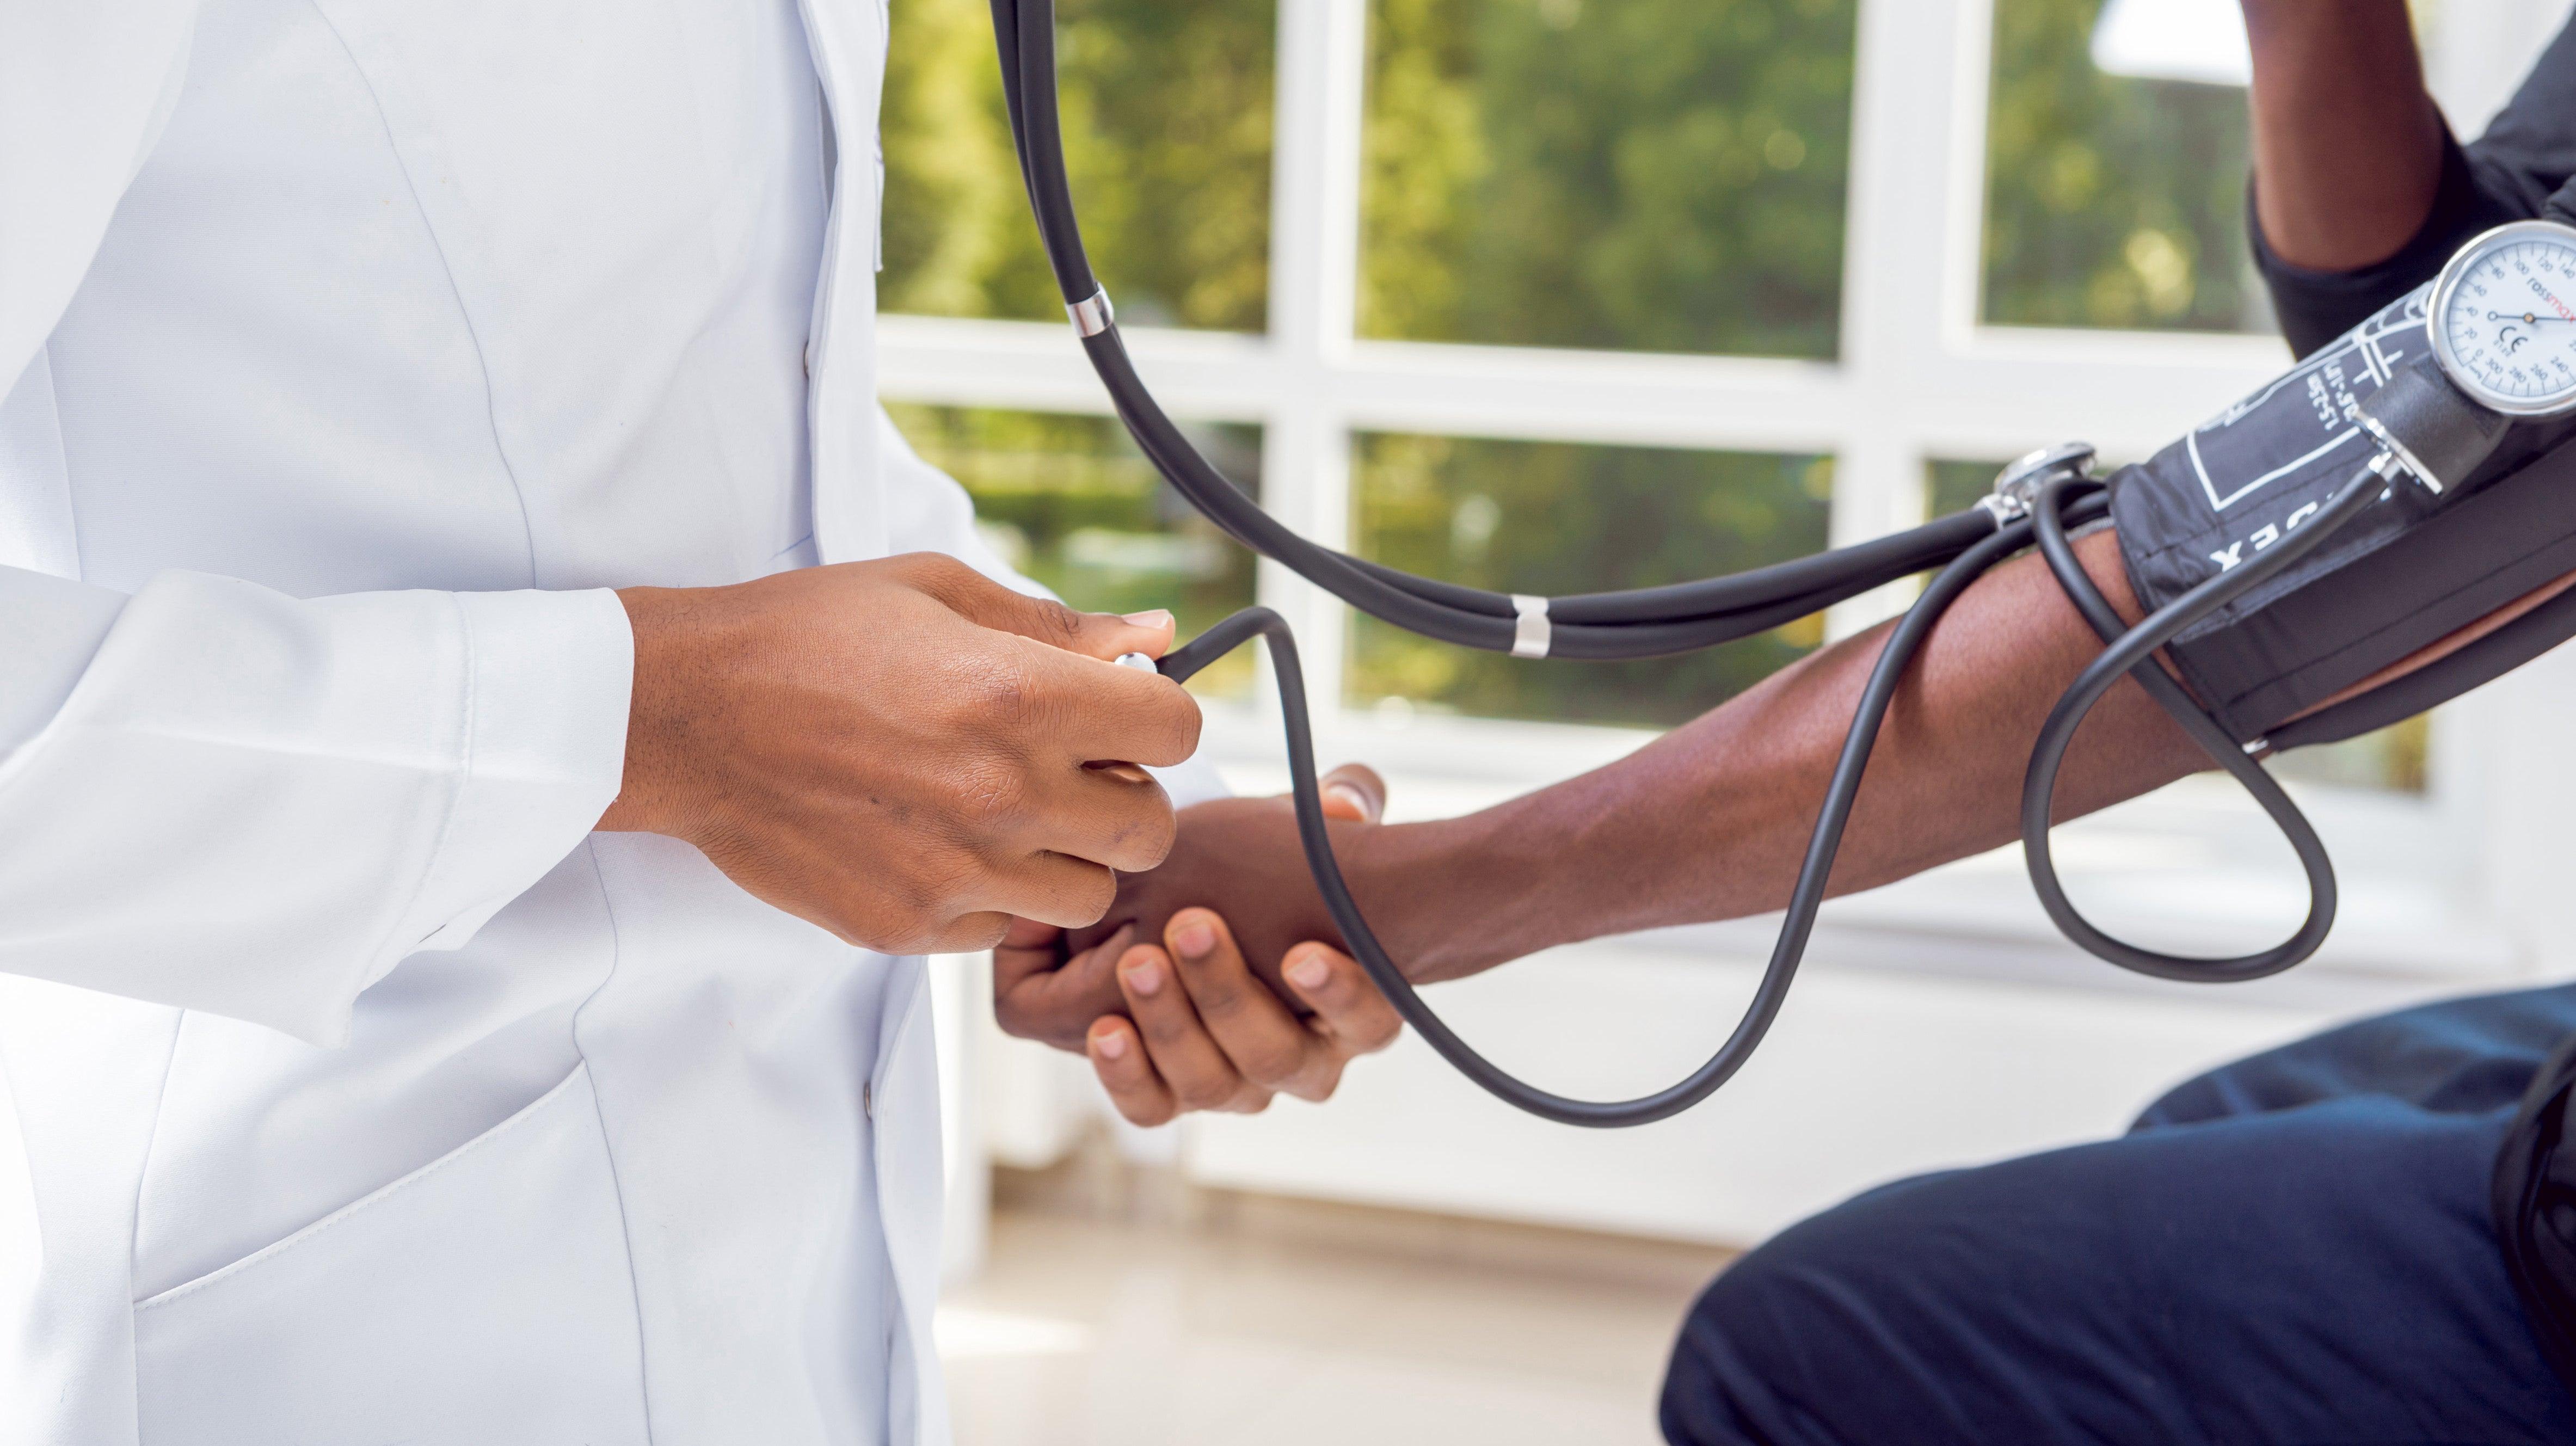 A Major U.S. Hospital Algorithm Is Biased Against Black Patients